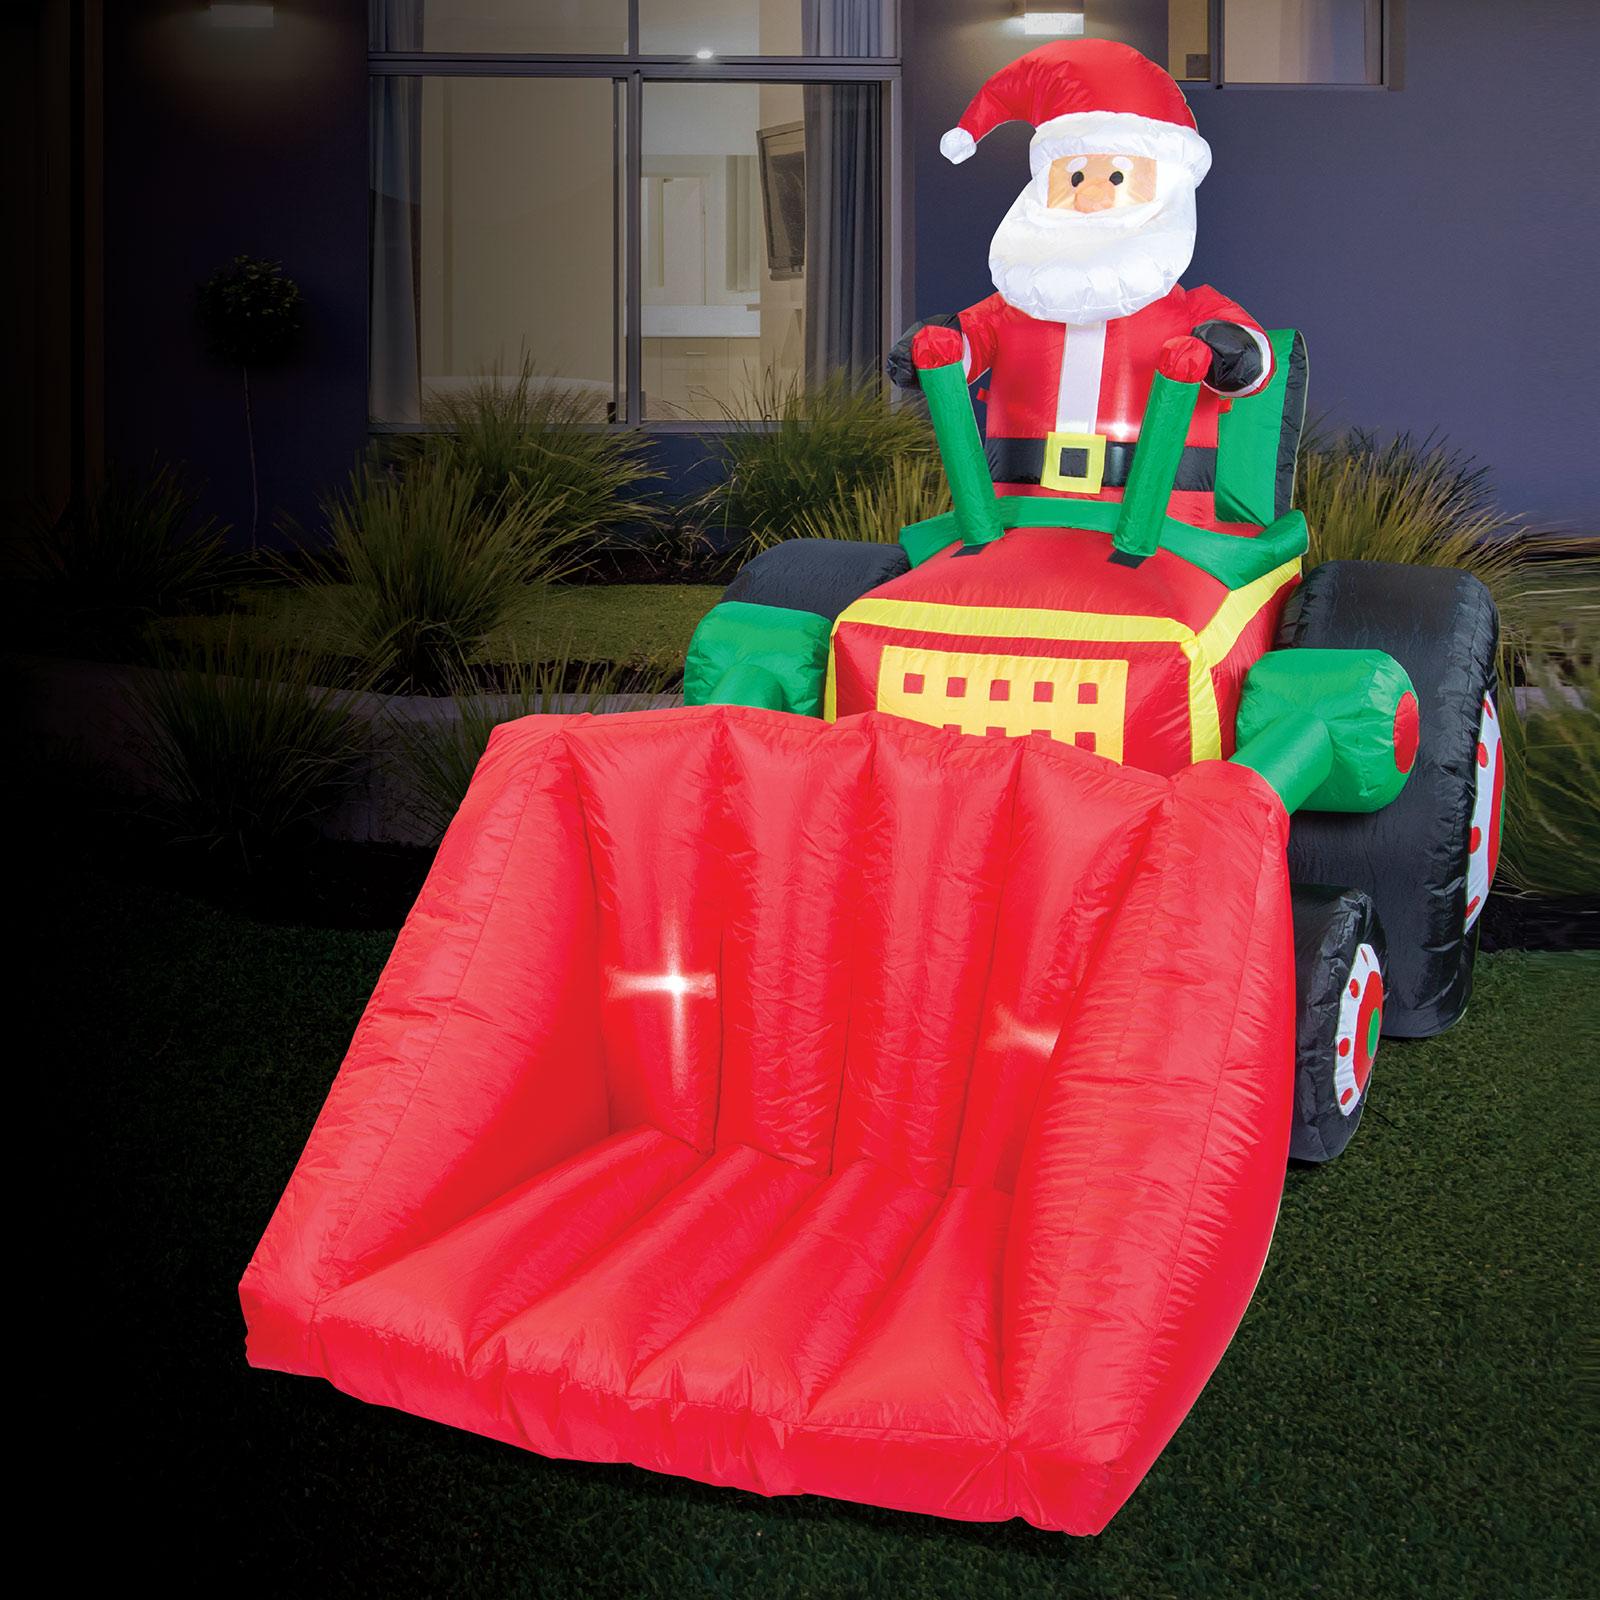 AIRPOWER SANTA Bulldozer Xmas Inflatable Decor Lights Up Indoor 2.15 x 1.5m